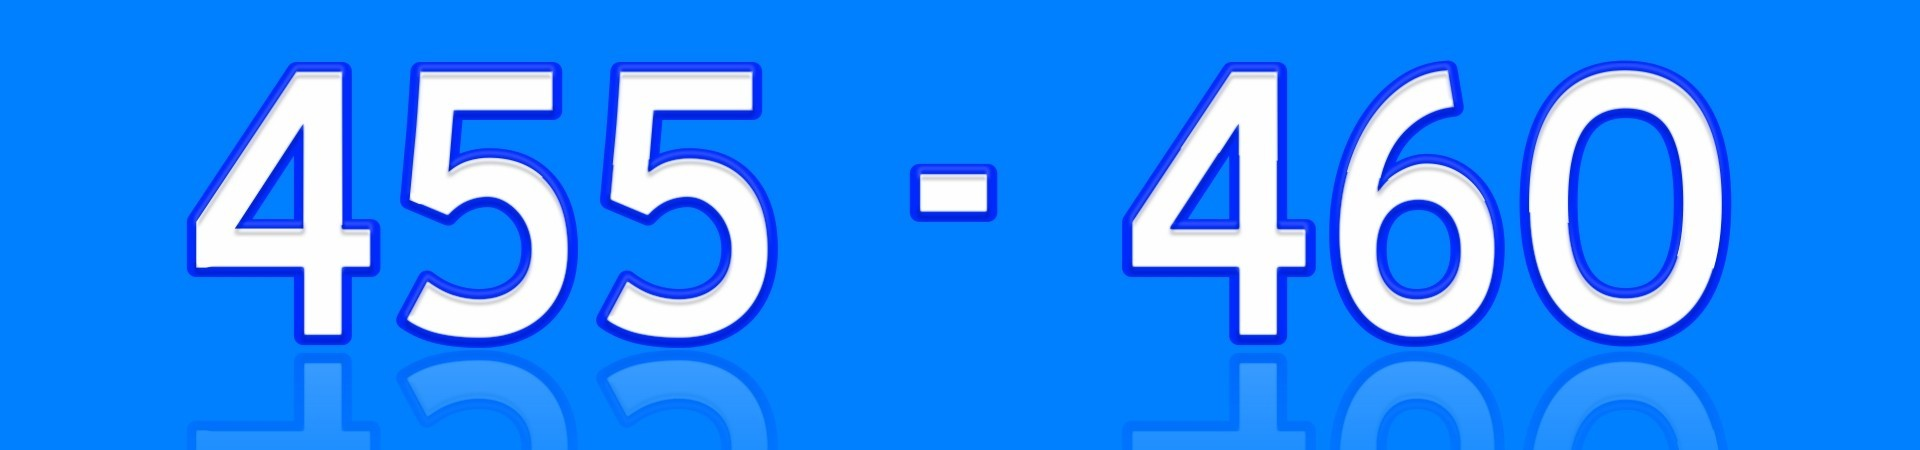 455 460